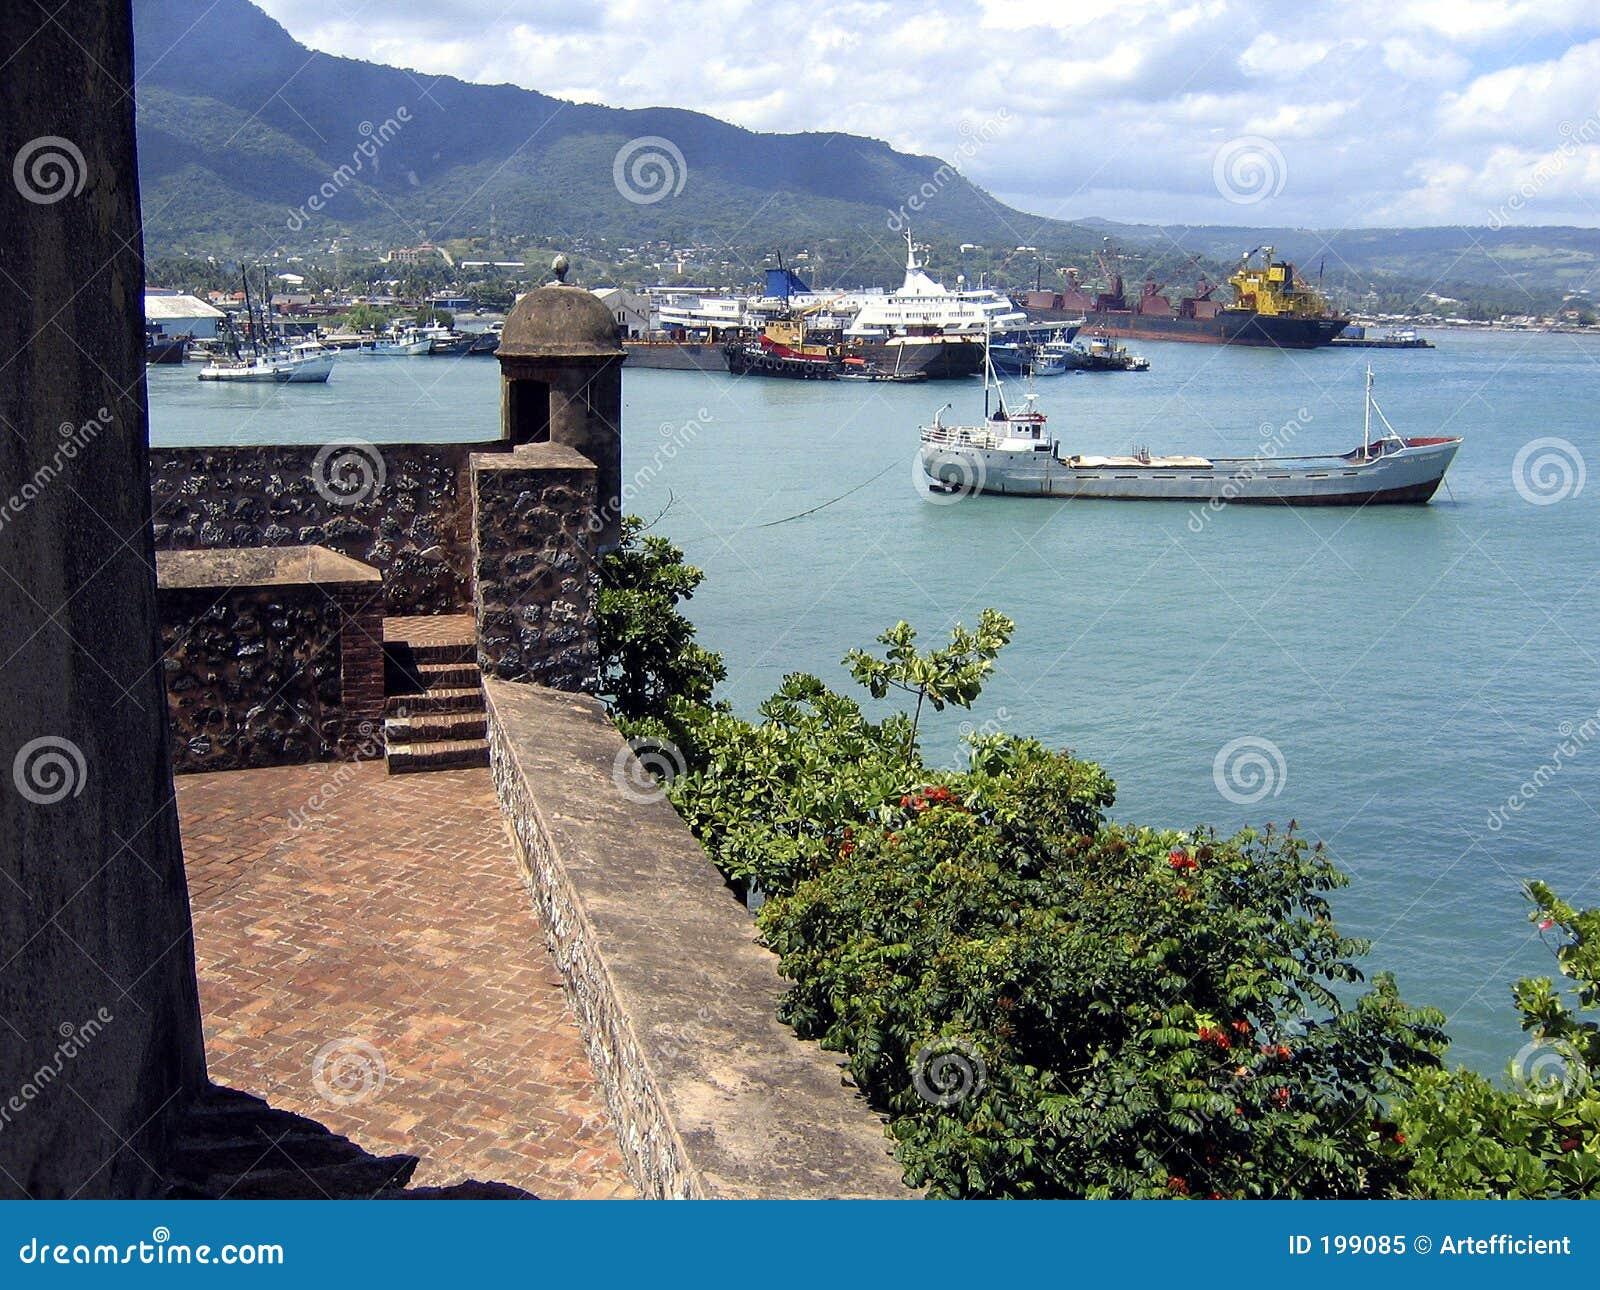 port of puerto plata